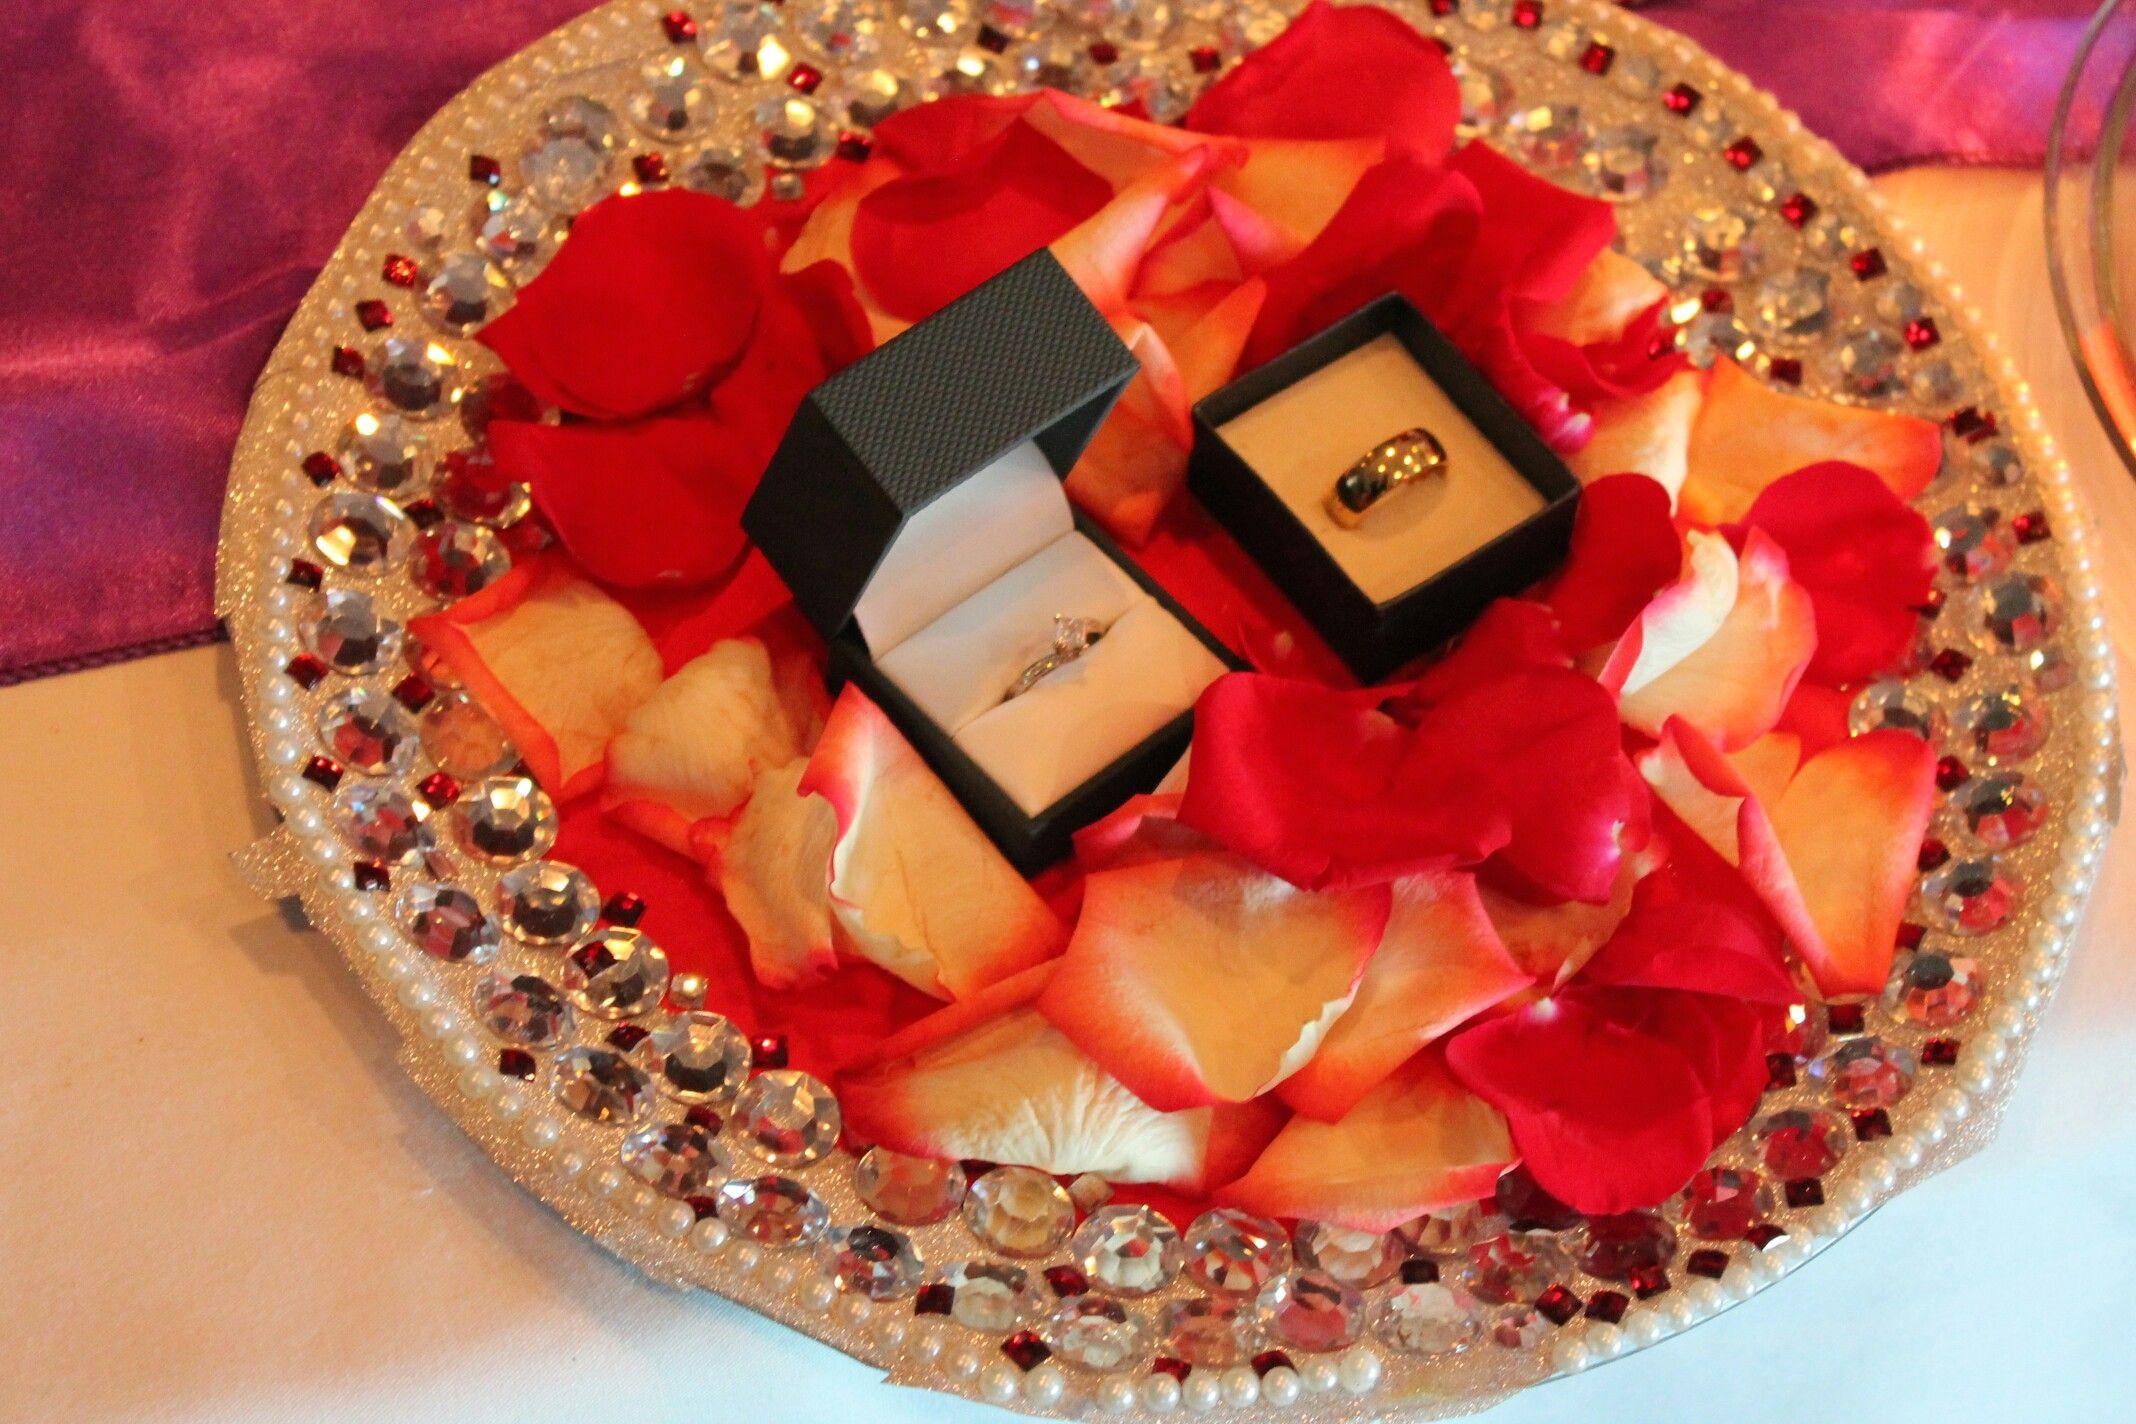 Wrddings Rings Plate Wedding Eng Rings Plate In 2019 Engagement